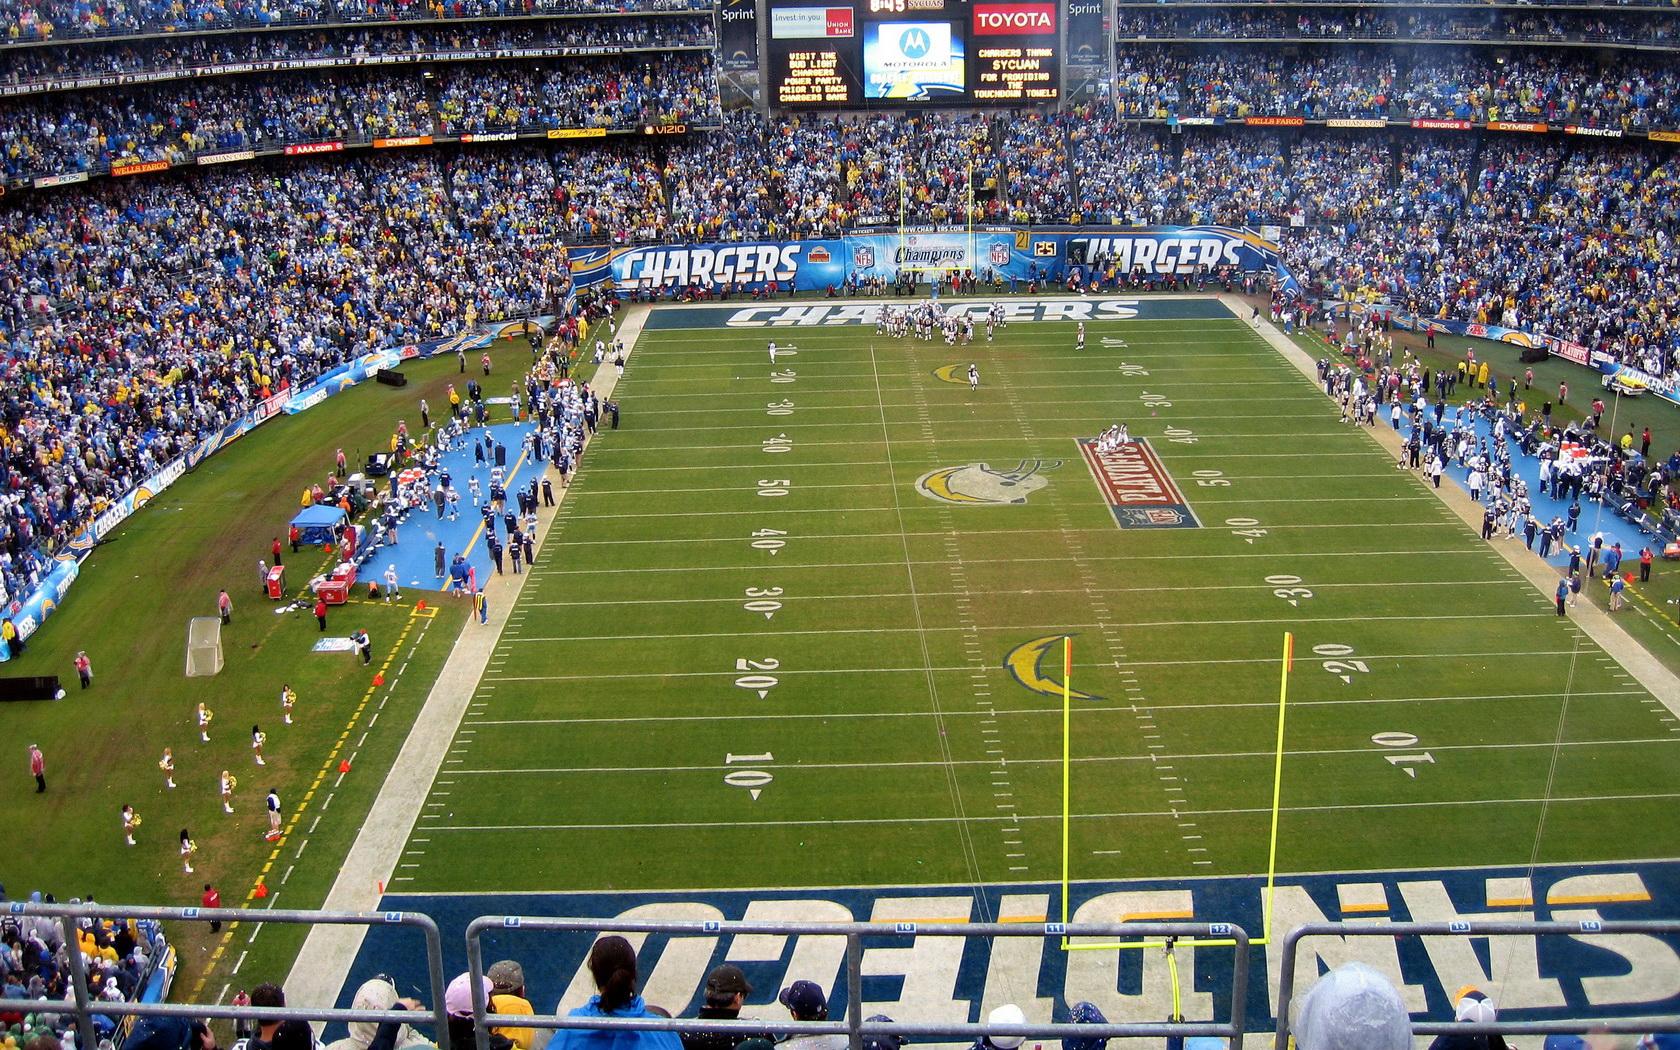 Stadium Nfl San Diego Chargers American Football People